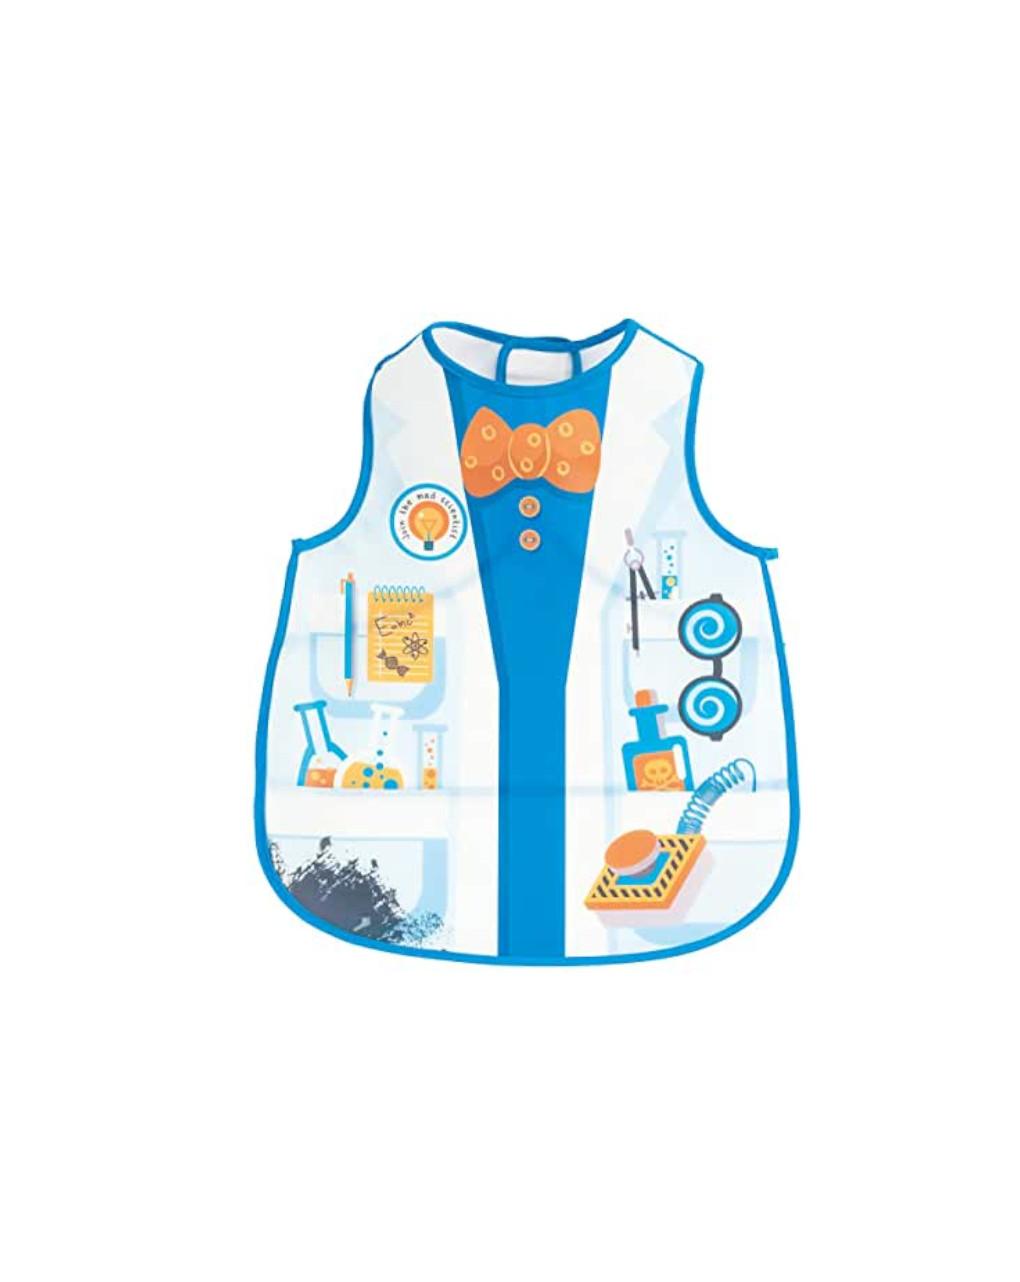 Bavaglino casacca scienziato - Lulabi Disney, Lullabi